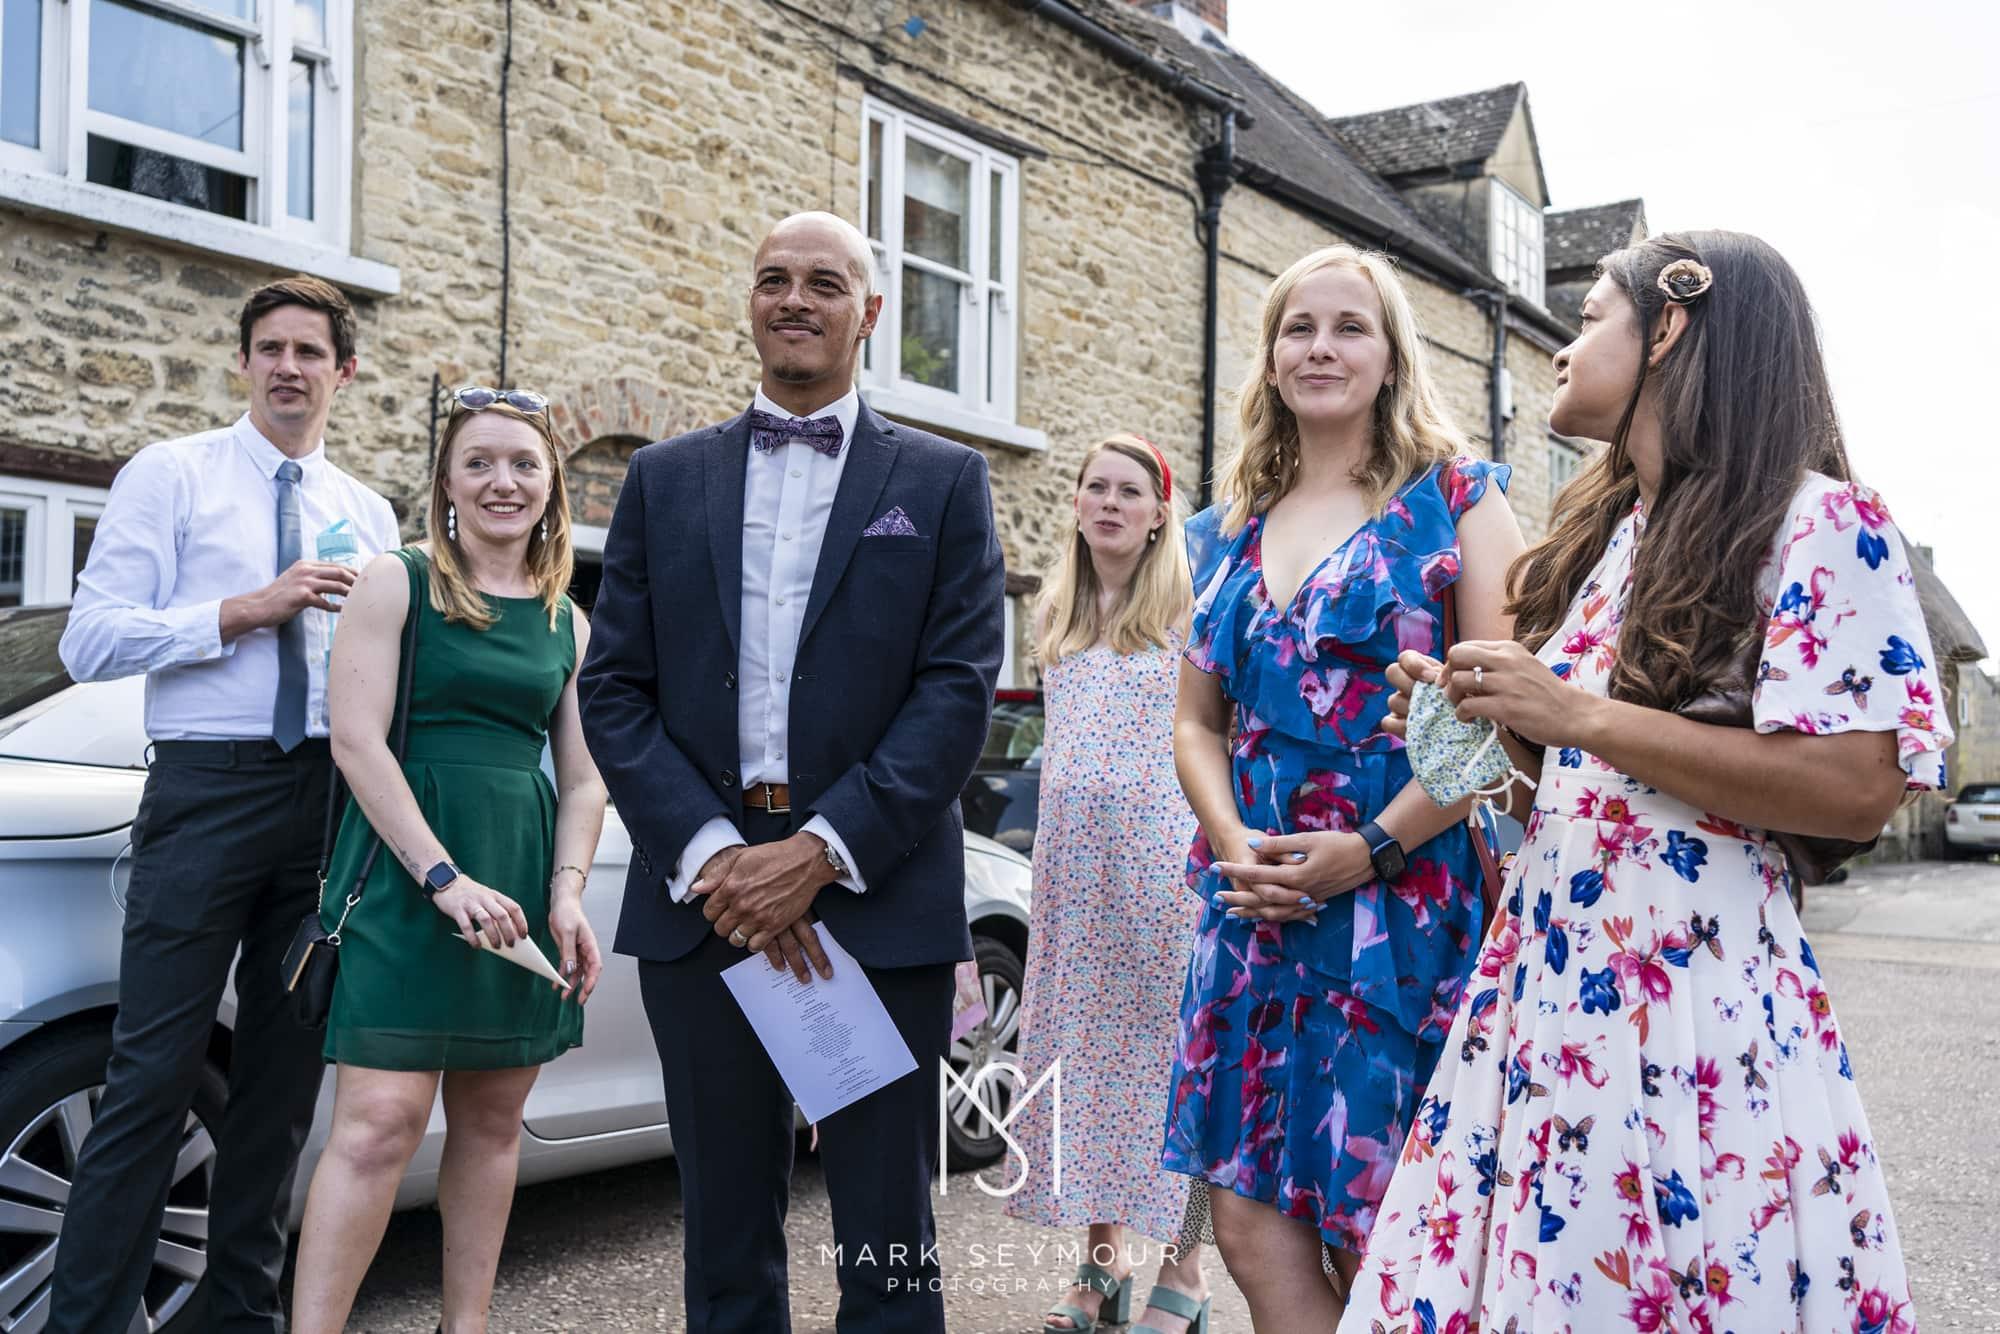 Barnsley House Wedding Photographer - Olivia and James' wedding 10